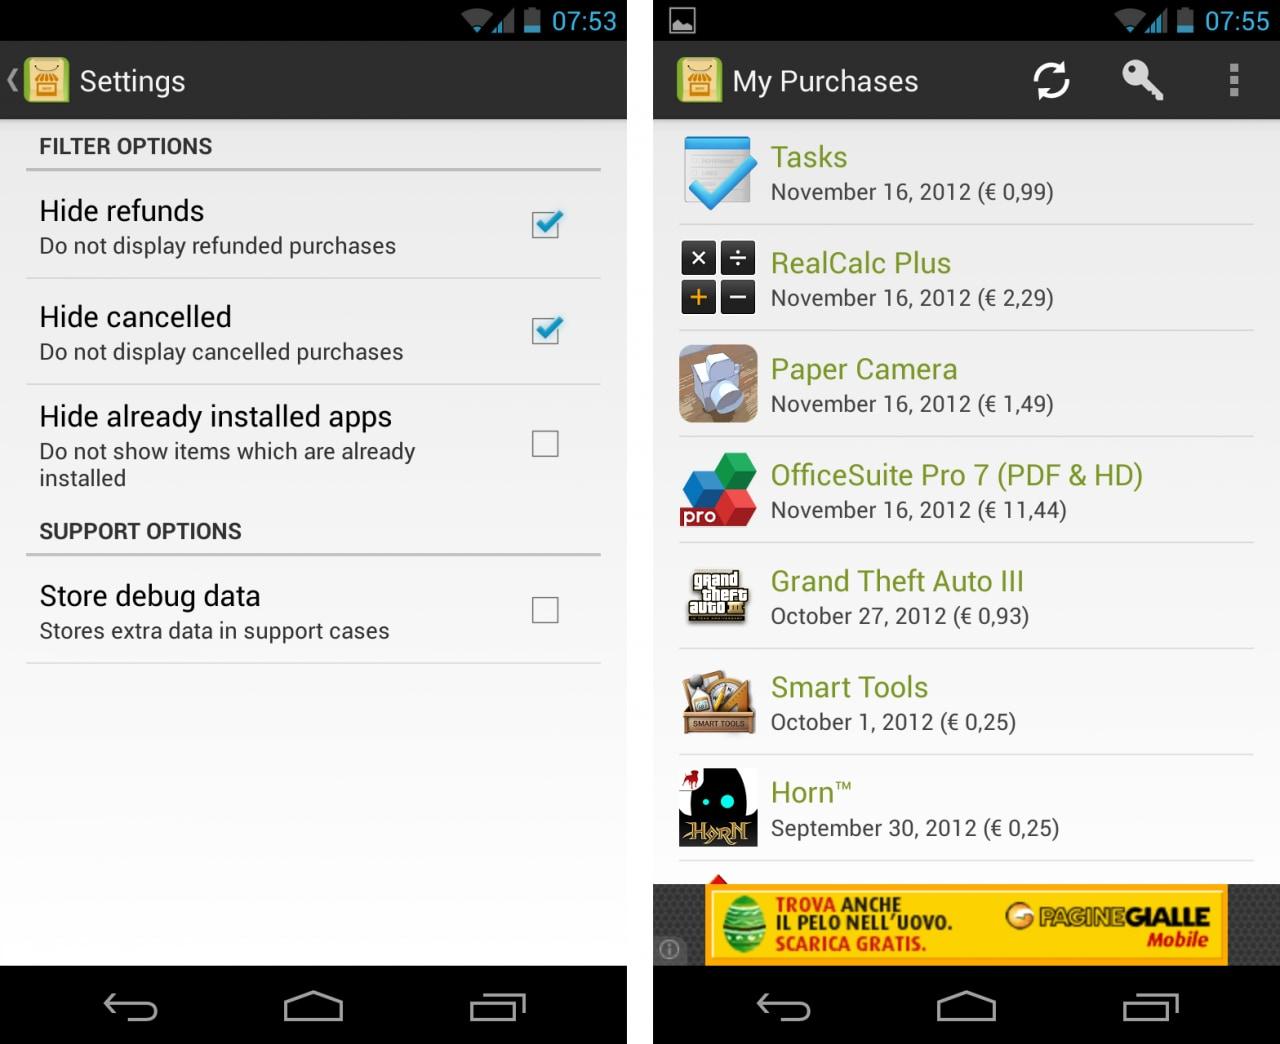 Screenshot_2013-03-27-07-53-42